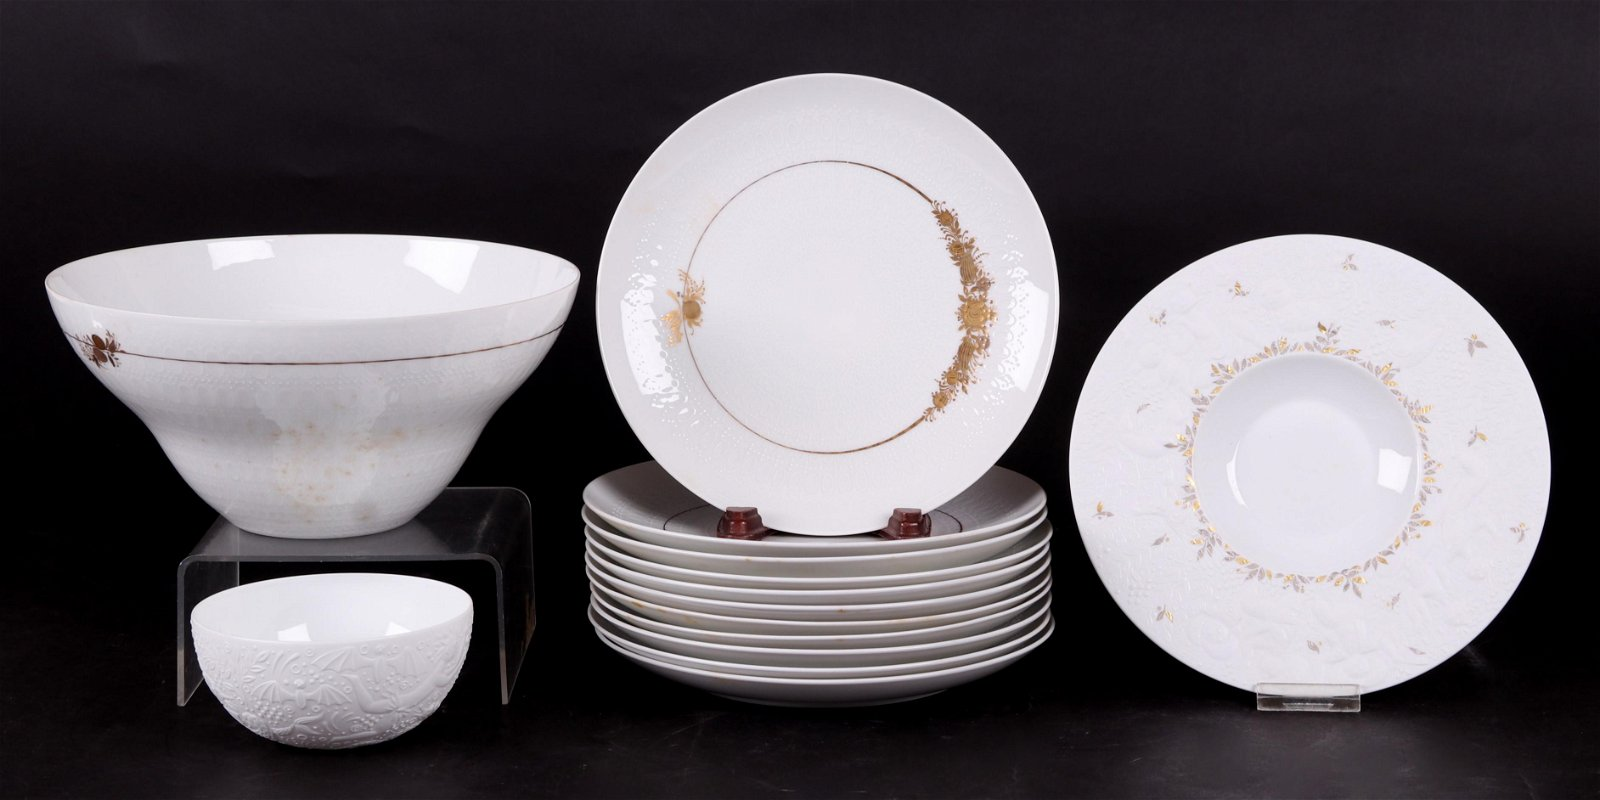 A Group of Rosenthal Porcelain, Magic Flute, Medley